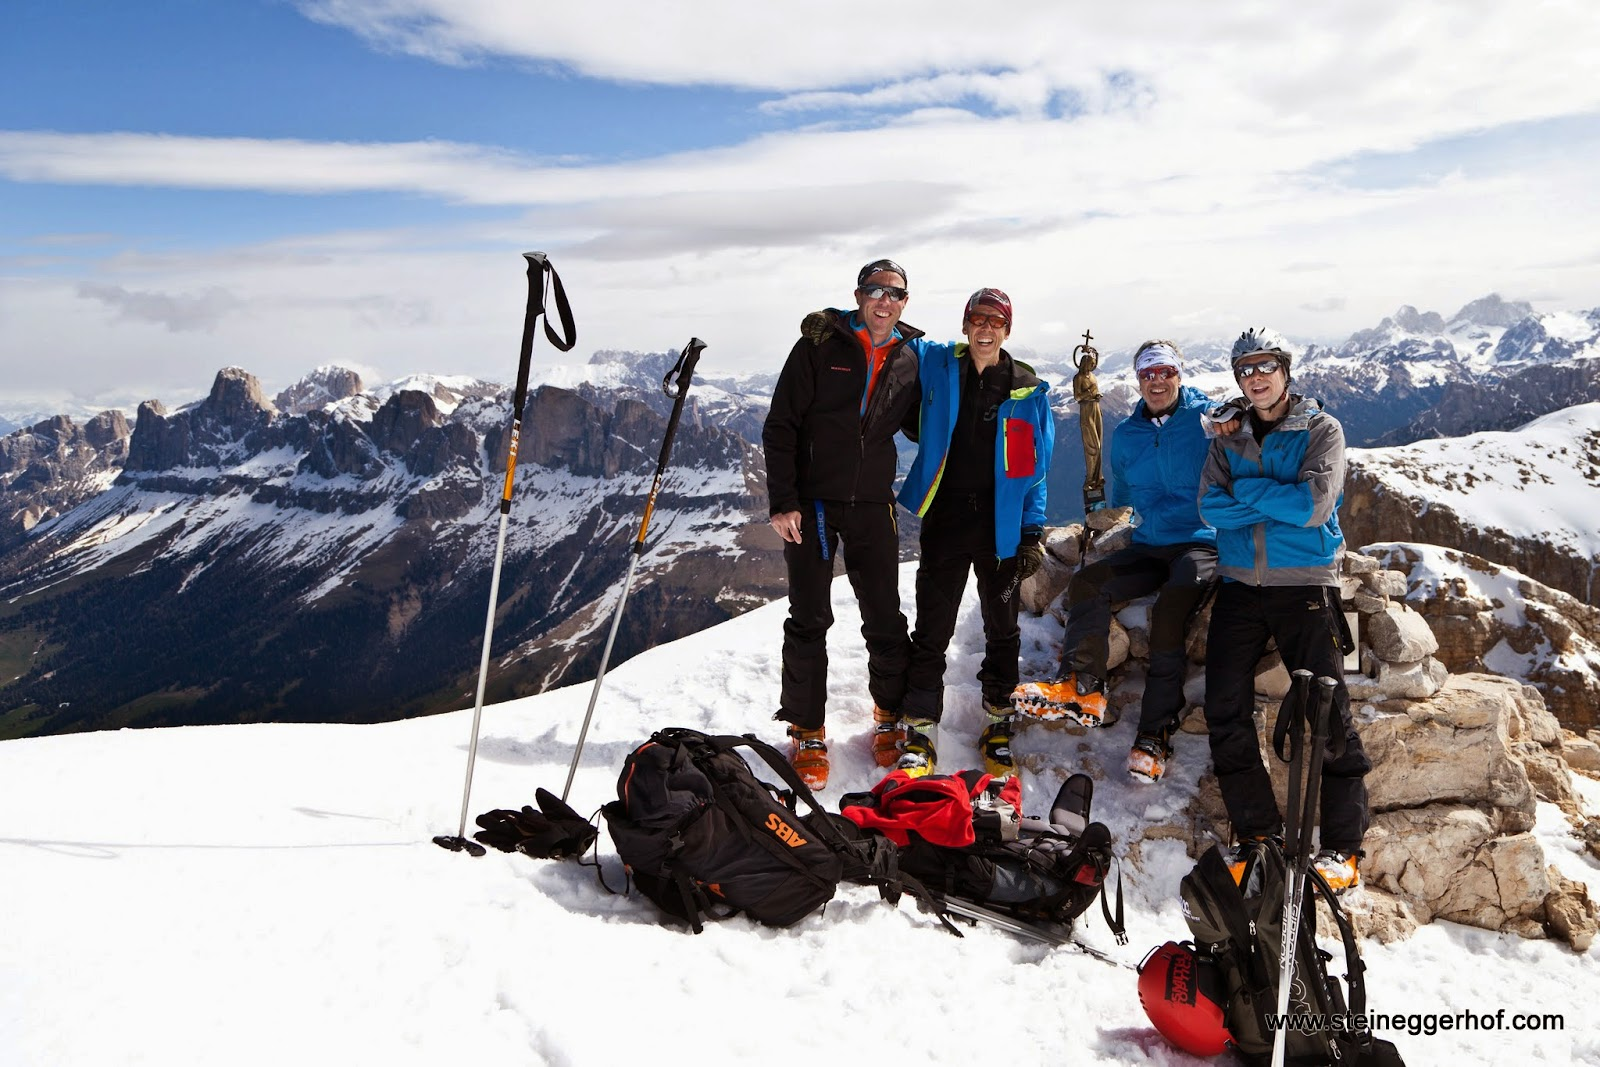 http://www.steineggerhof.com/de/hotelinformationen/fotogalerie/skitour-latemar-17-05-14-id-6014467630039636097.html